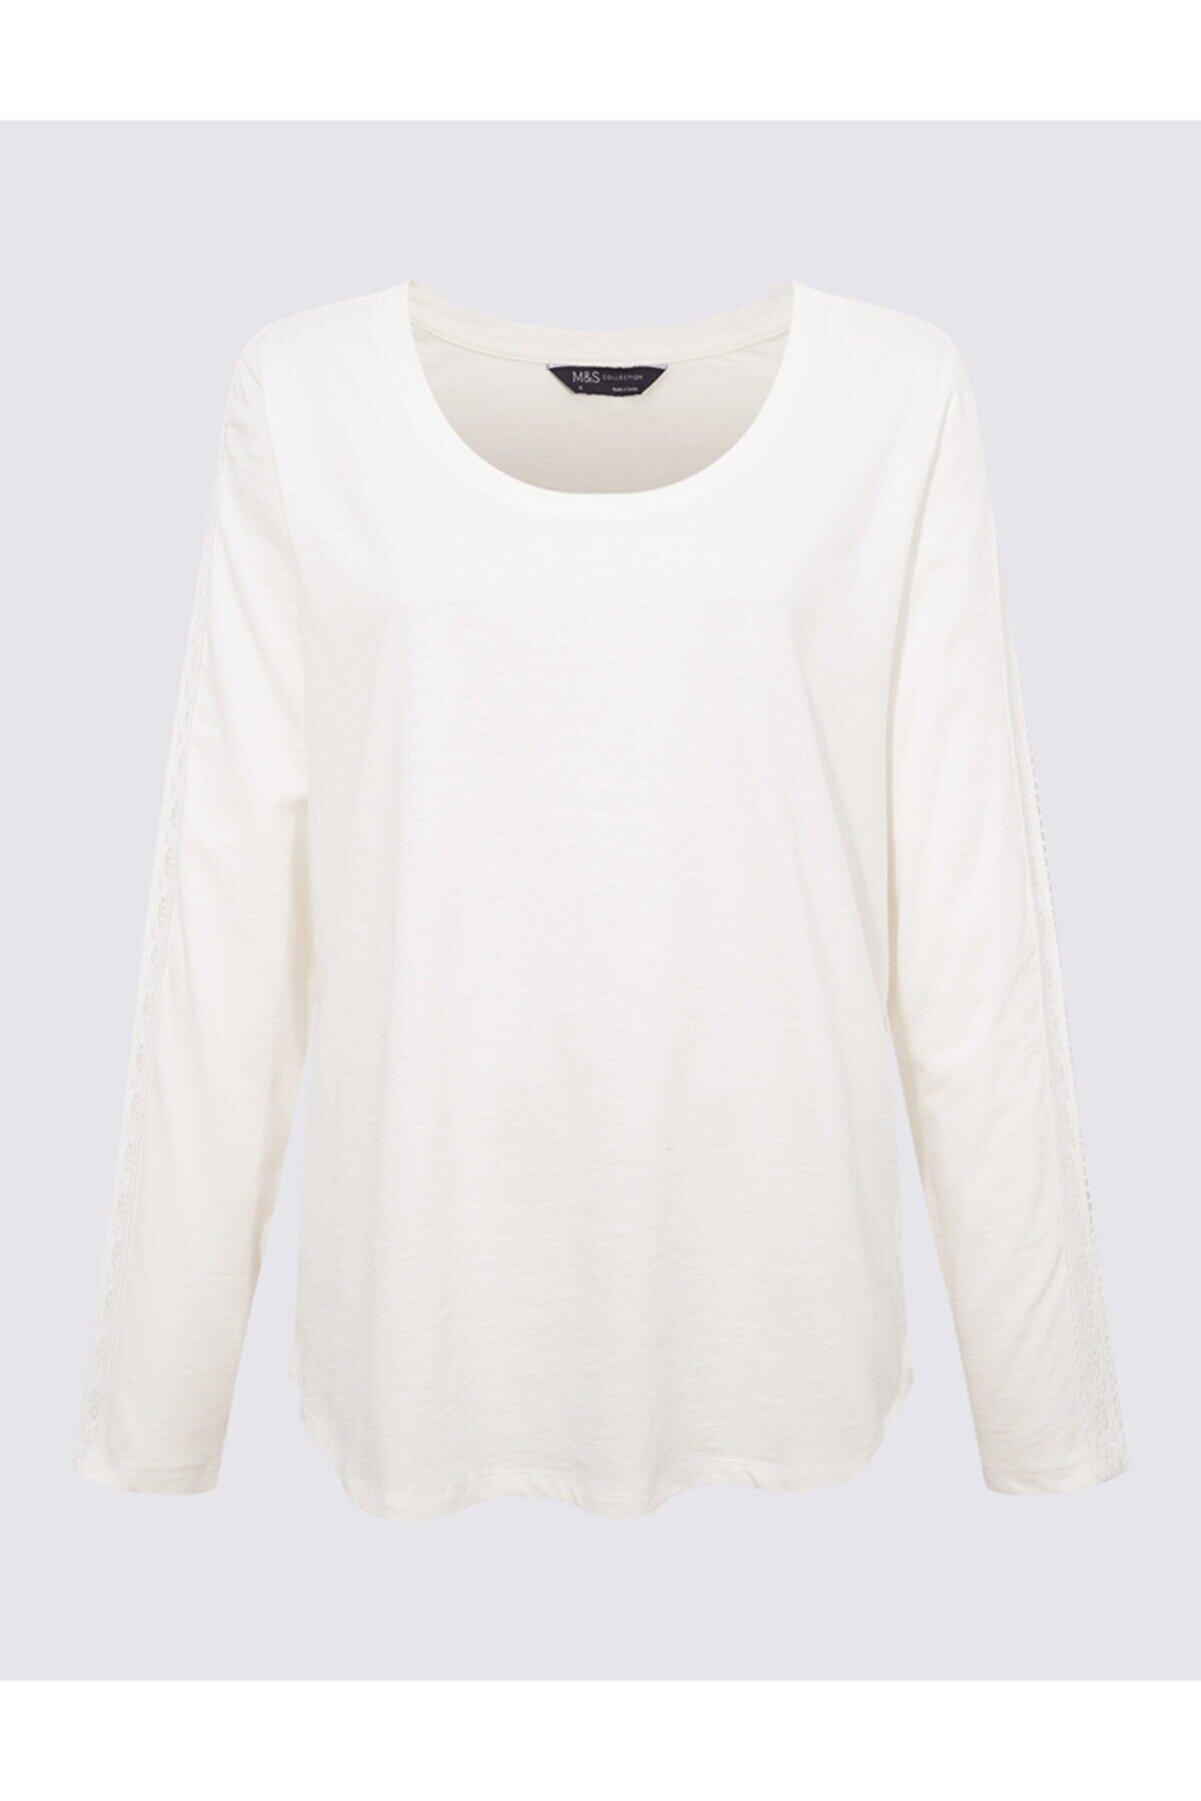 Marks & Spencer Dantelli Uzun Kollu T-shirt